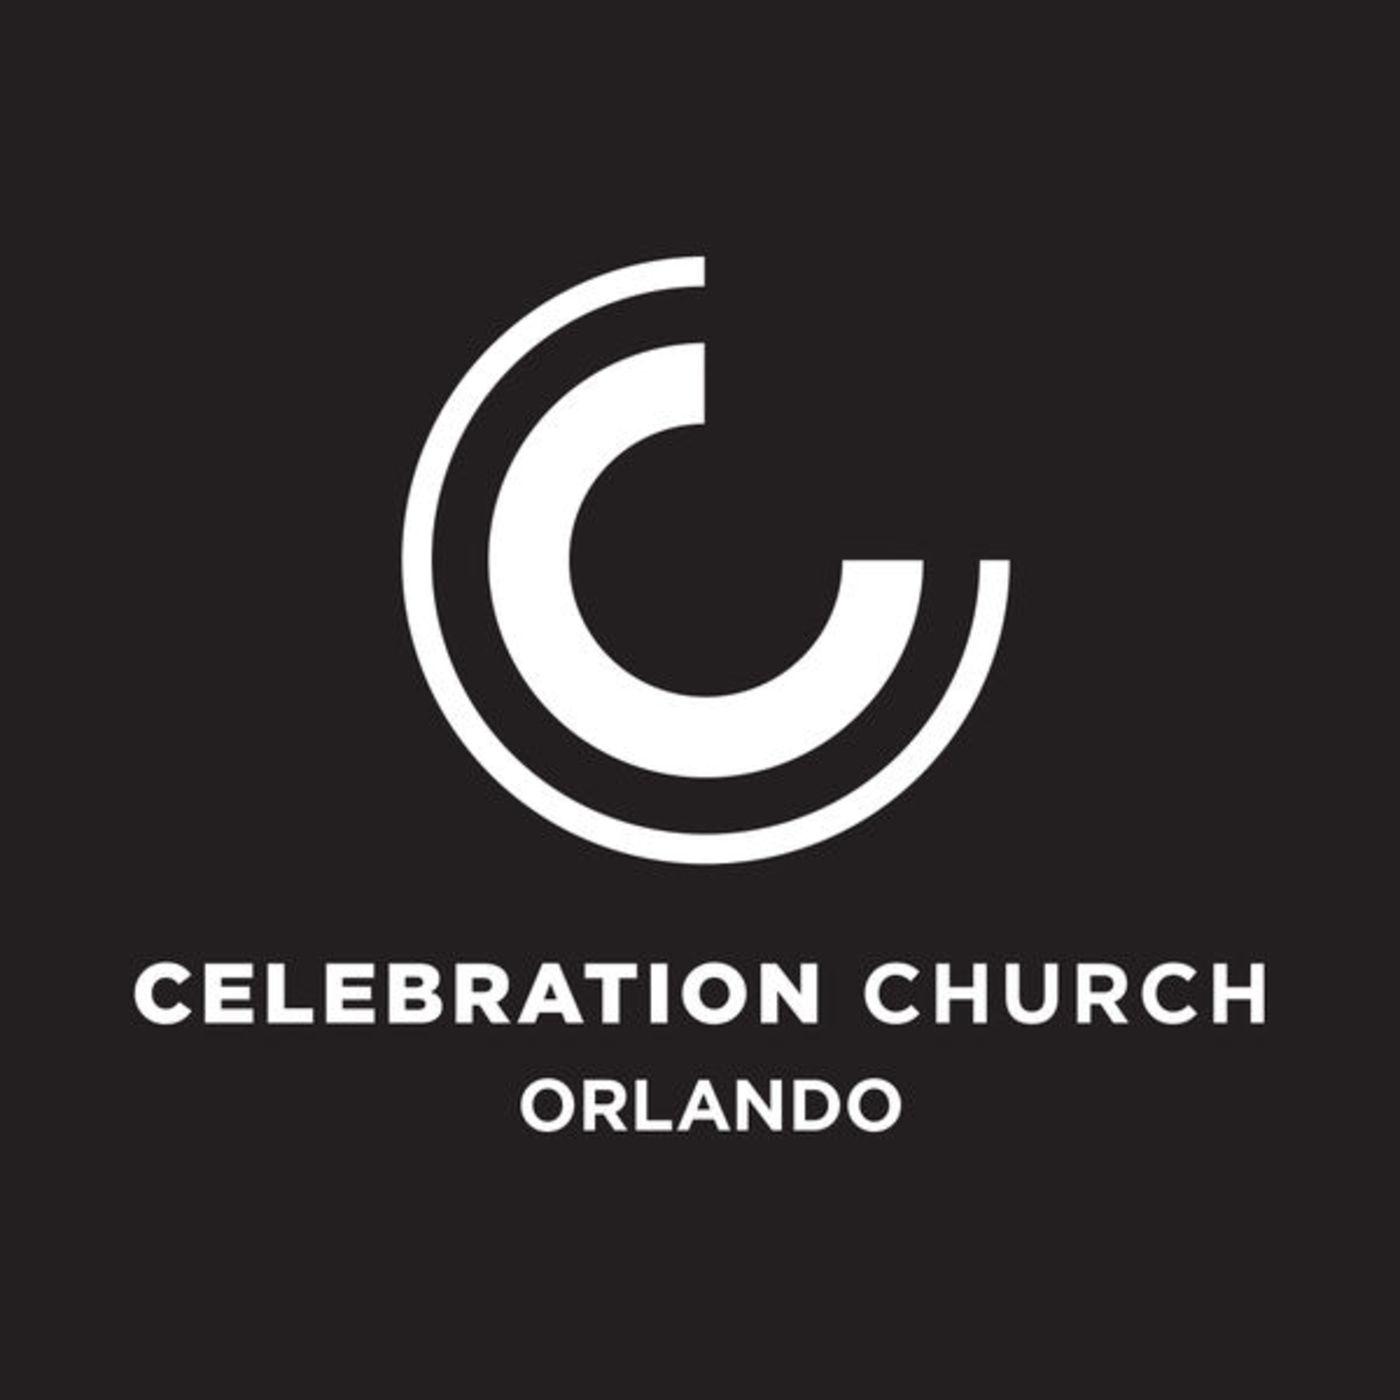 <![CDATA[Celebration Church Orlando]]>